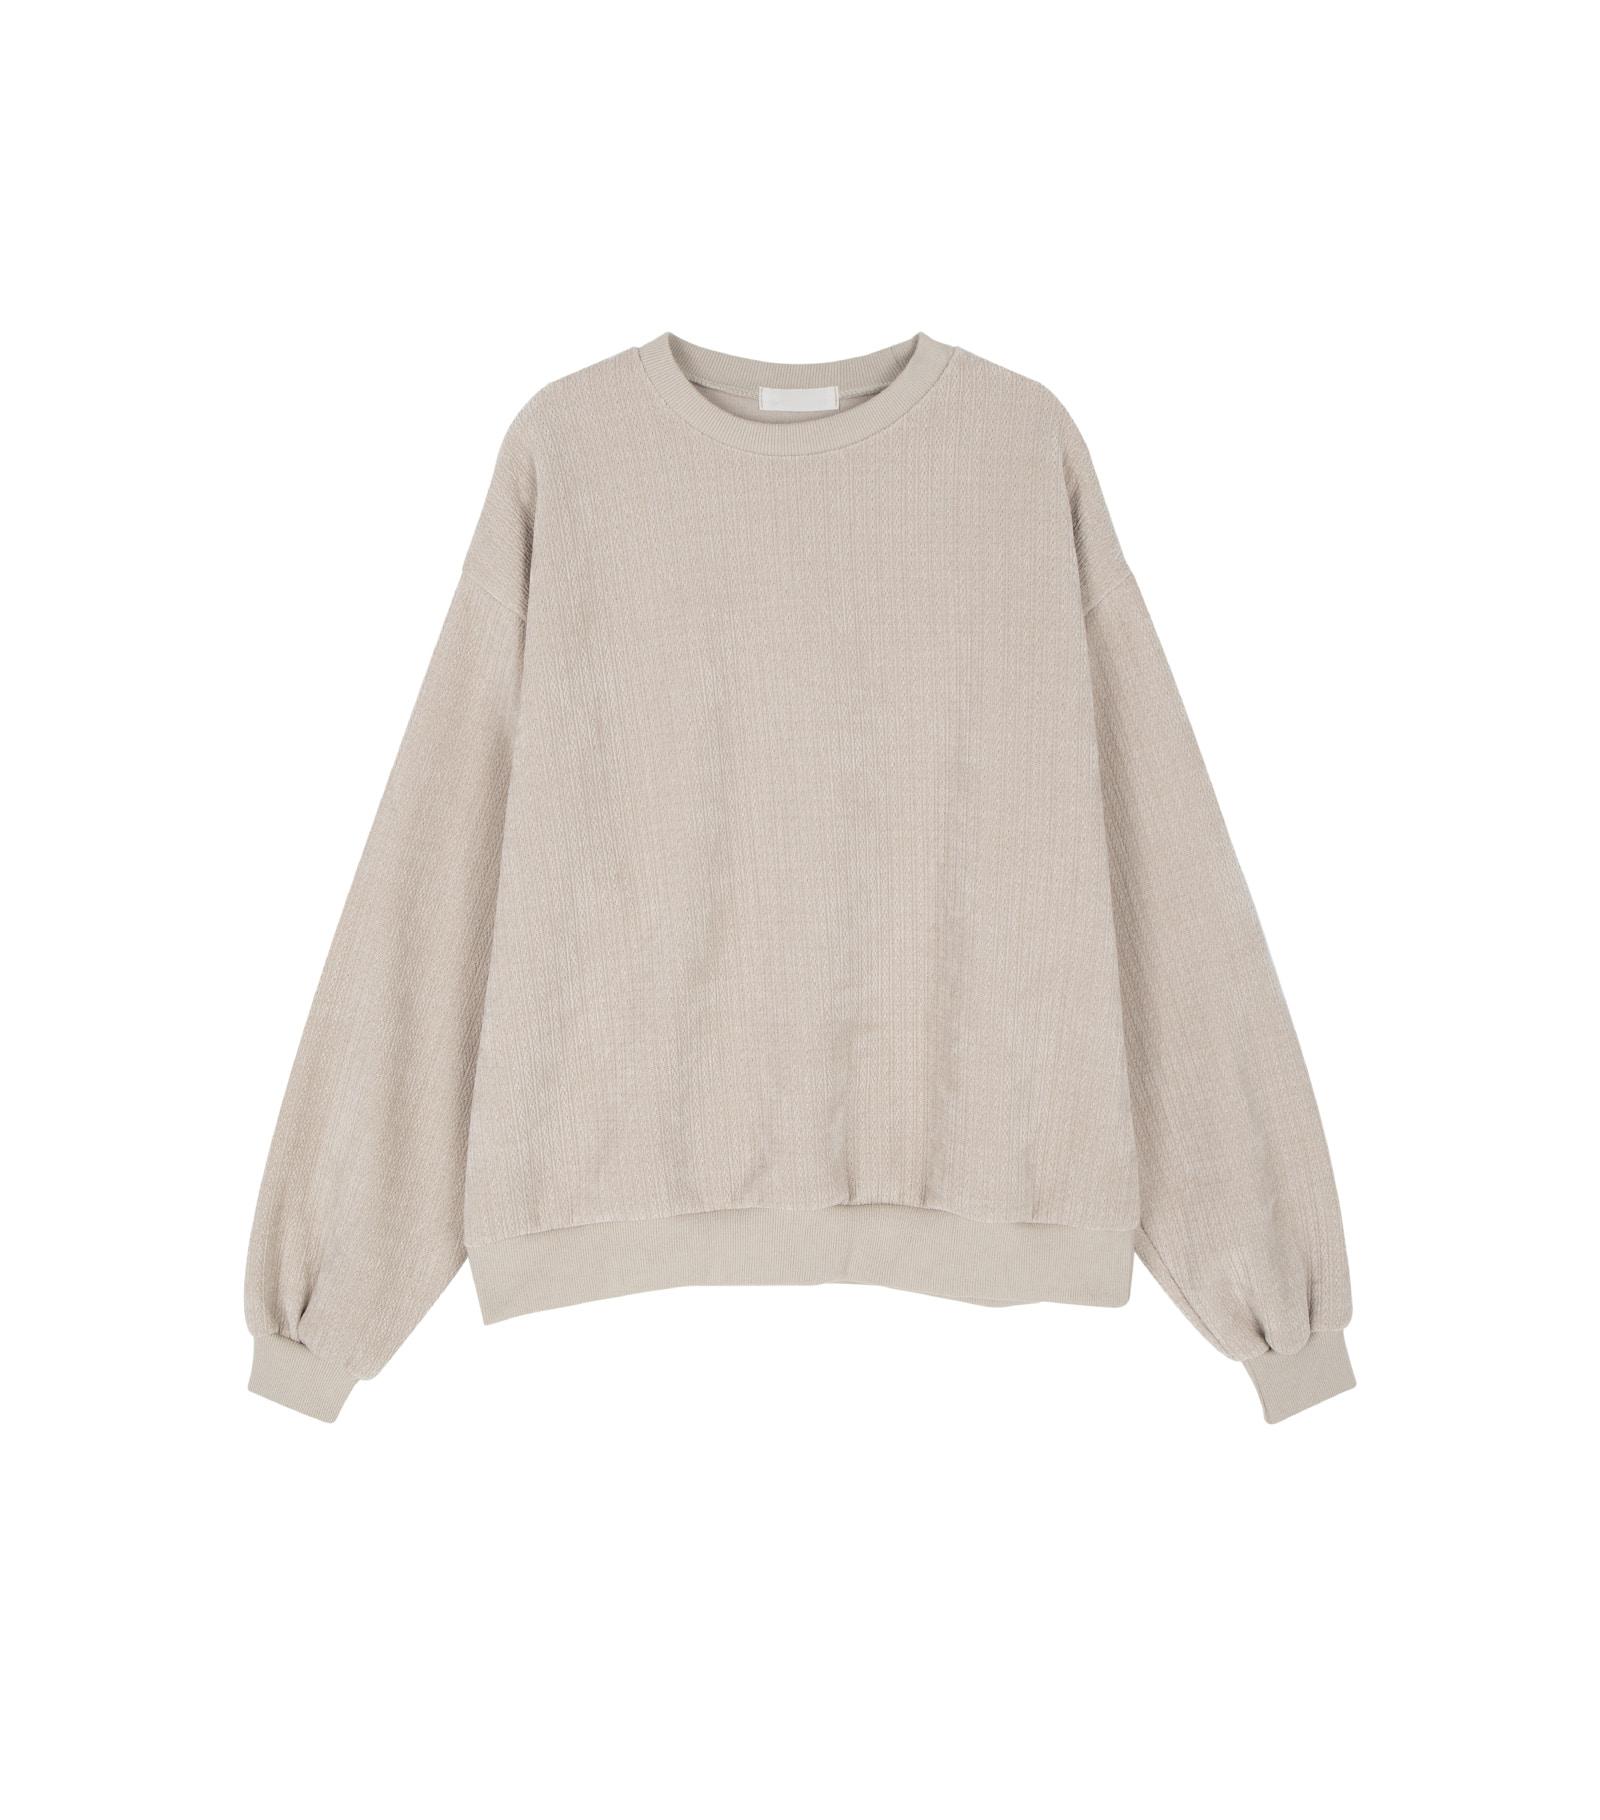 Only velvet crew neck sweatshirt